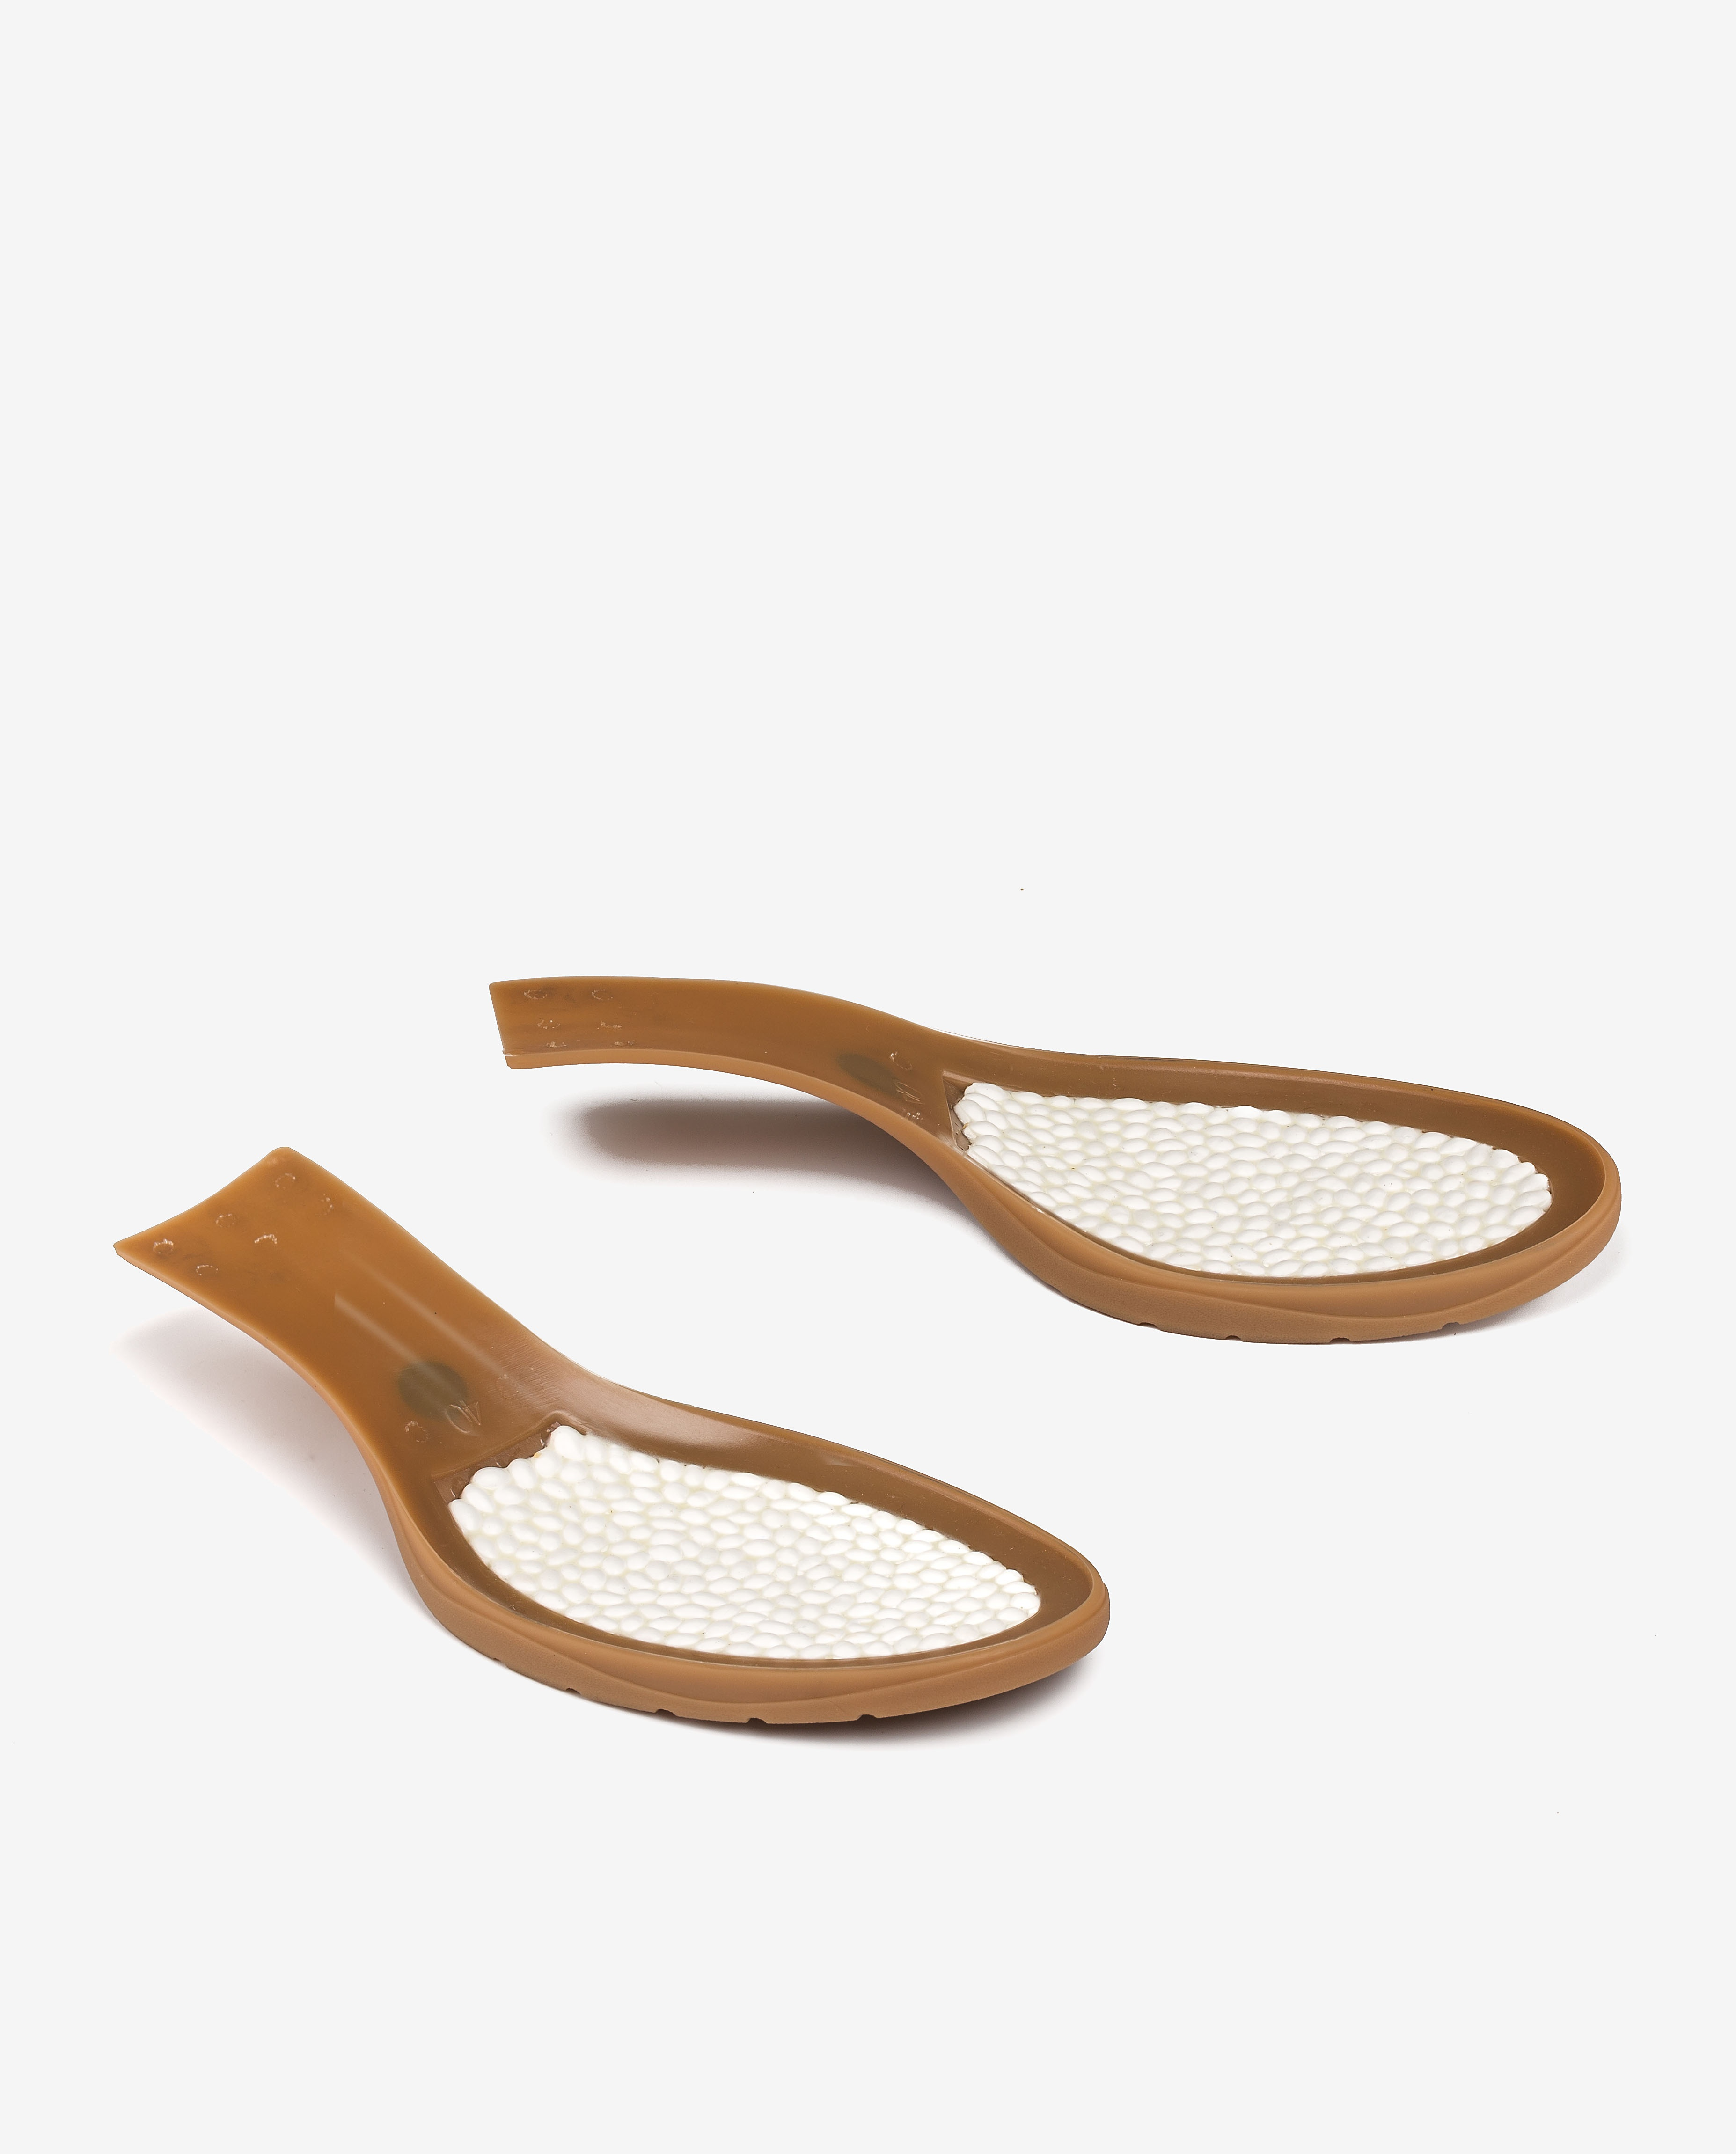 UNISA Goldfarbene Sandaletten mit Absatz in Holz-Optik GODOY_LMT platino 5